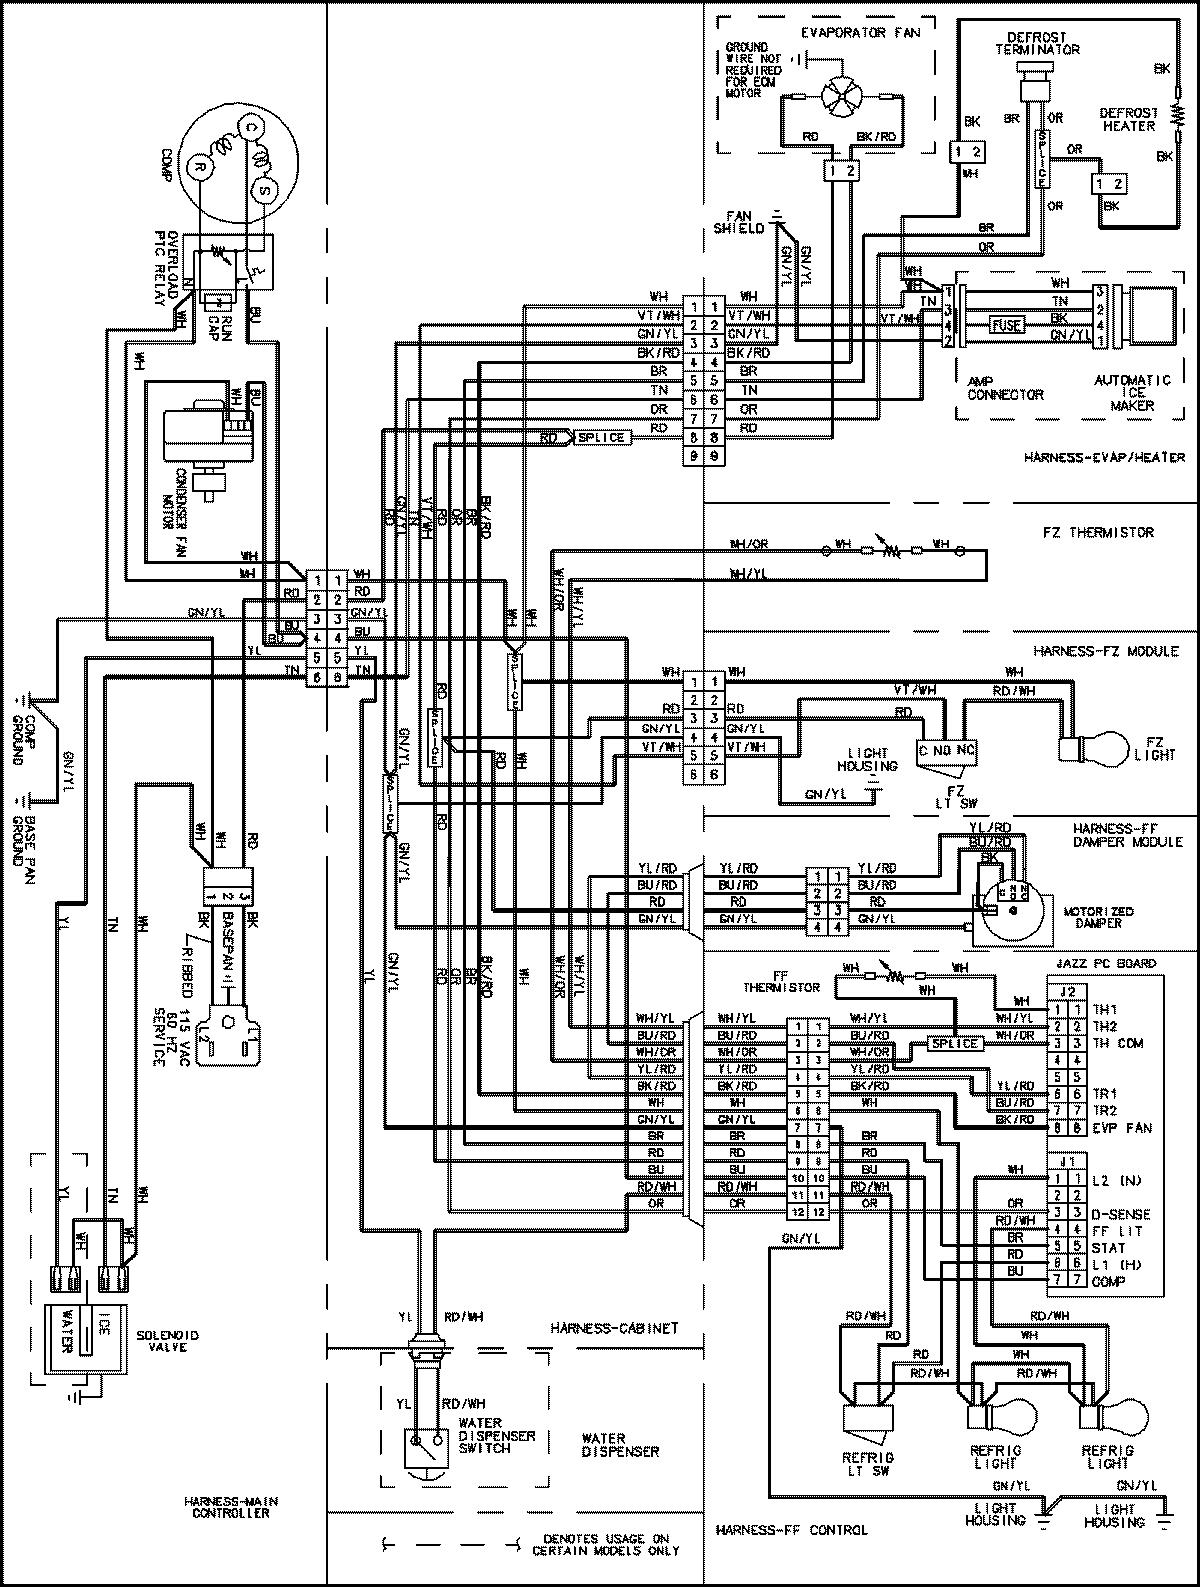 Hvac Wiring Diagram Furthermore Amana Furnace Blower Wiring Diagram